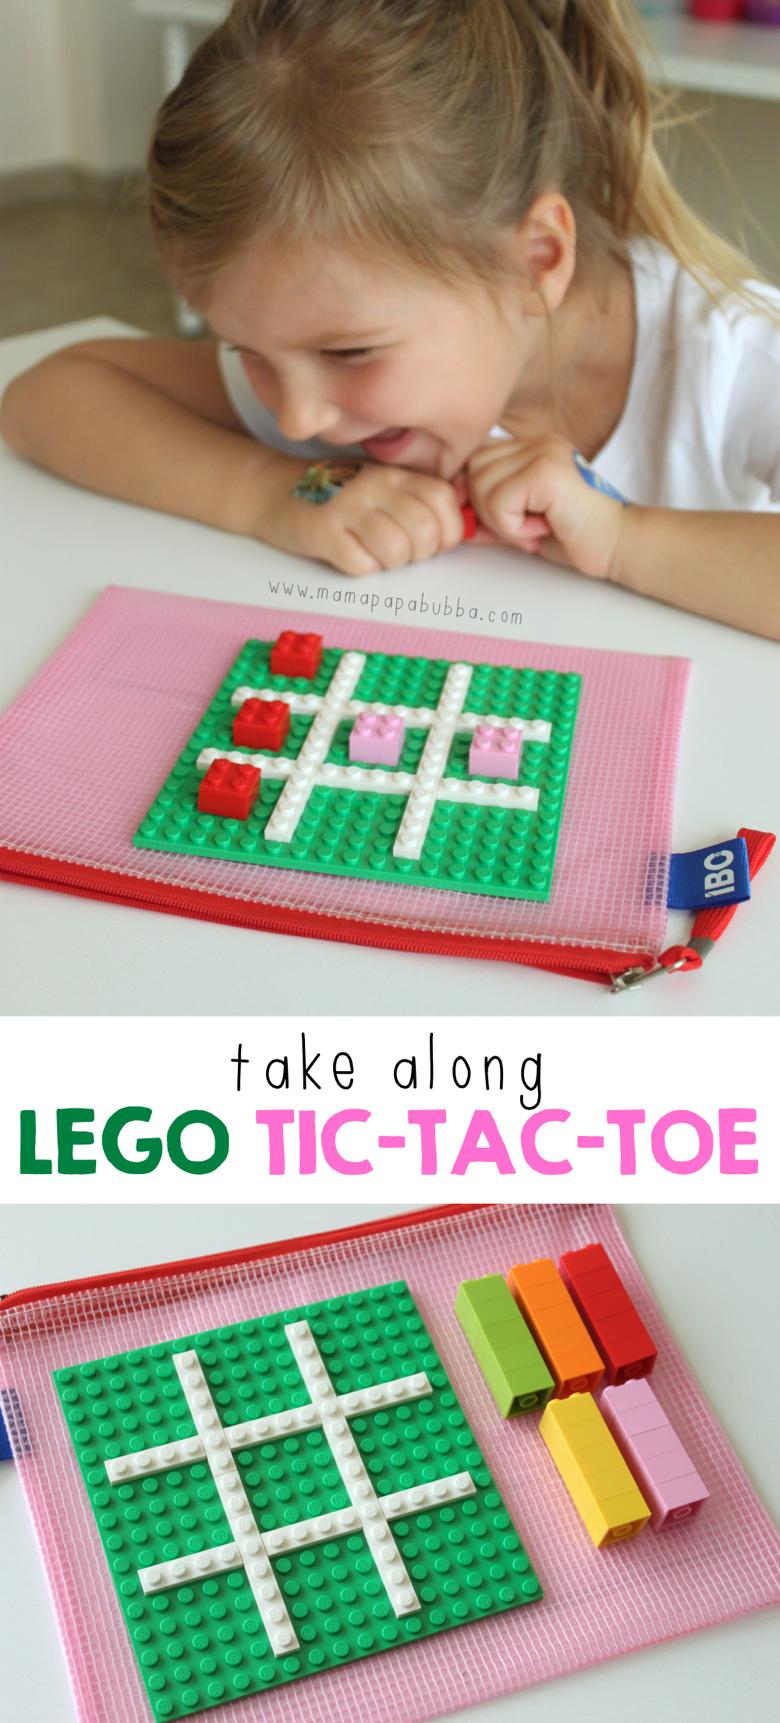 Take Along LEGO Tic Tac Toe | Mama Papa Bubba